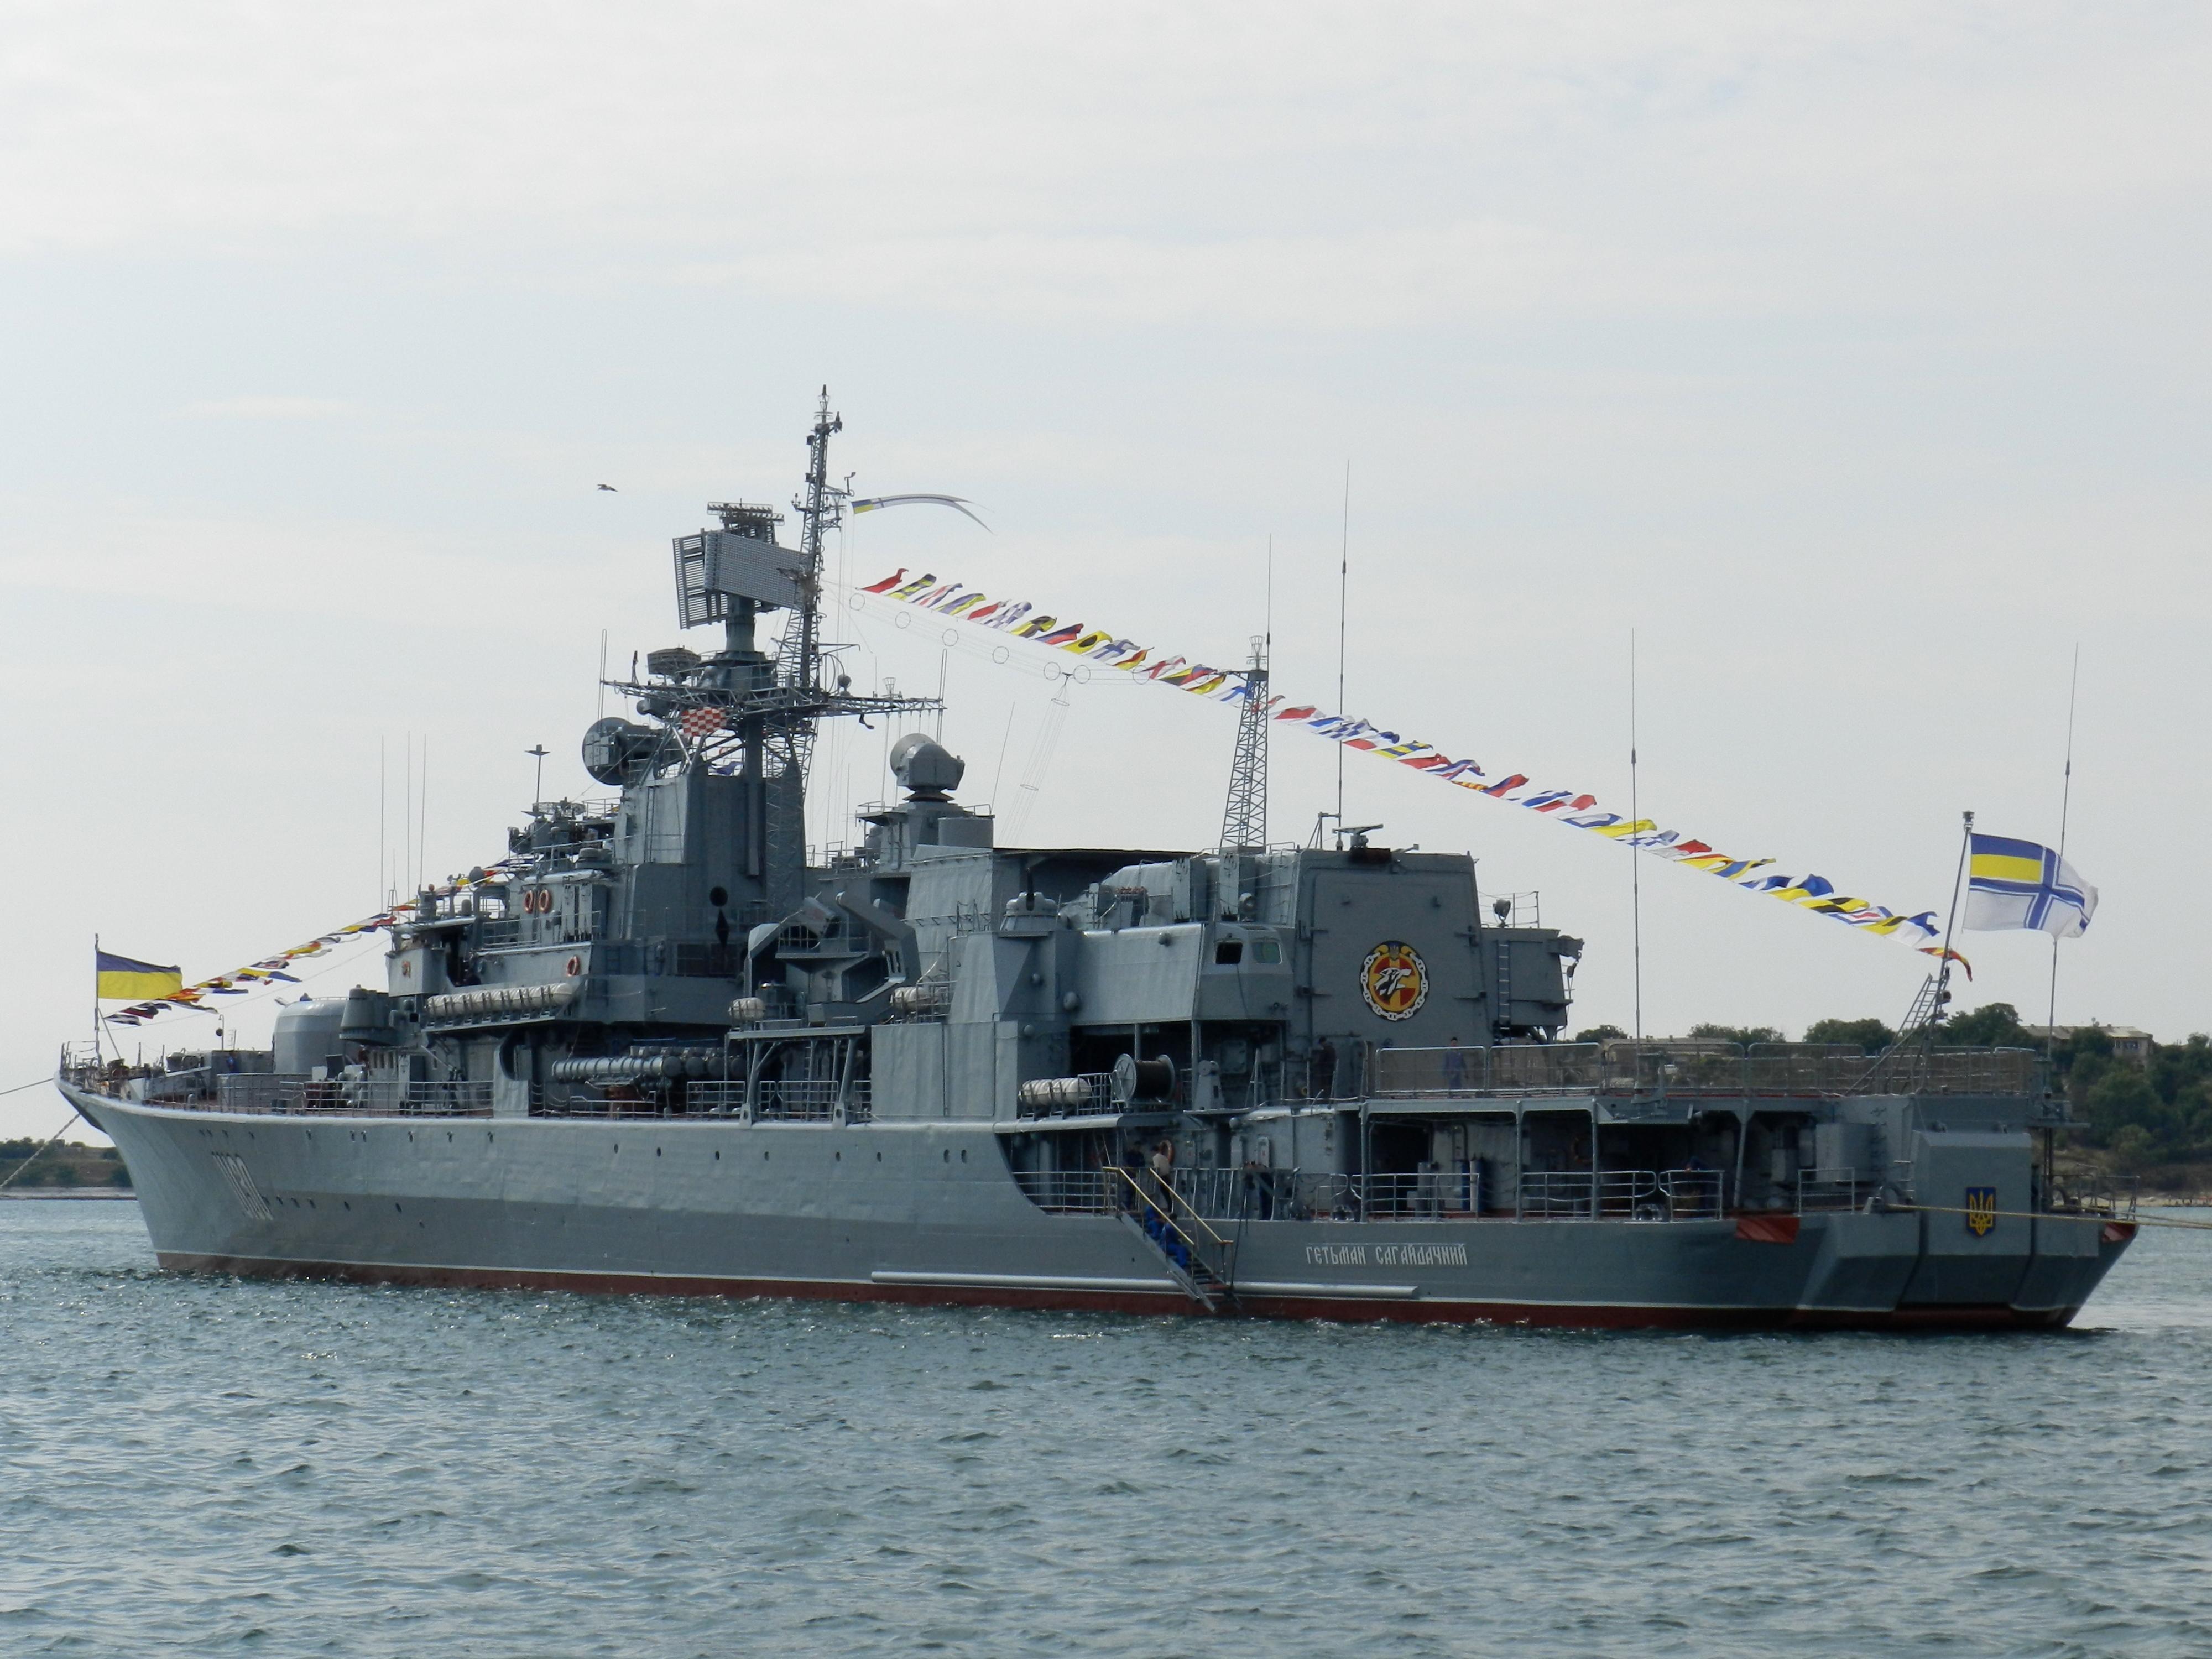 Ukrainian Armed Forces / Zbroyni Syly Ukrayiny - Page 2 1345621